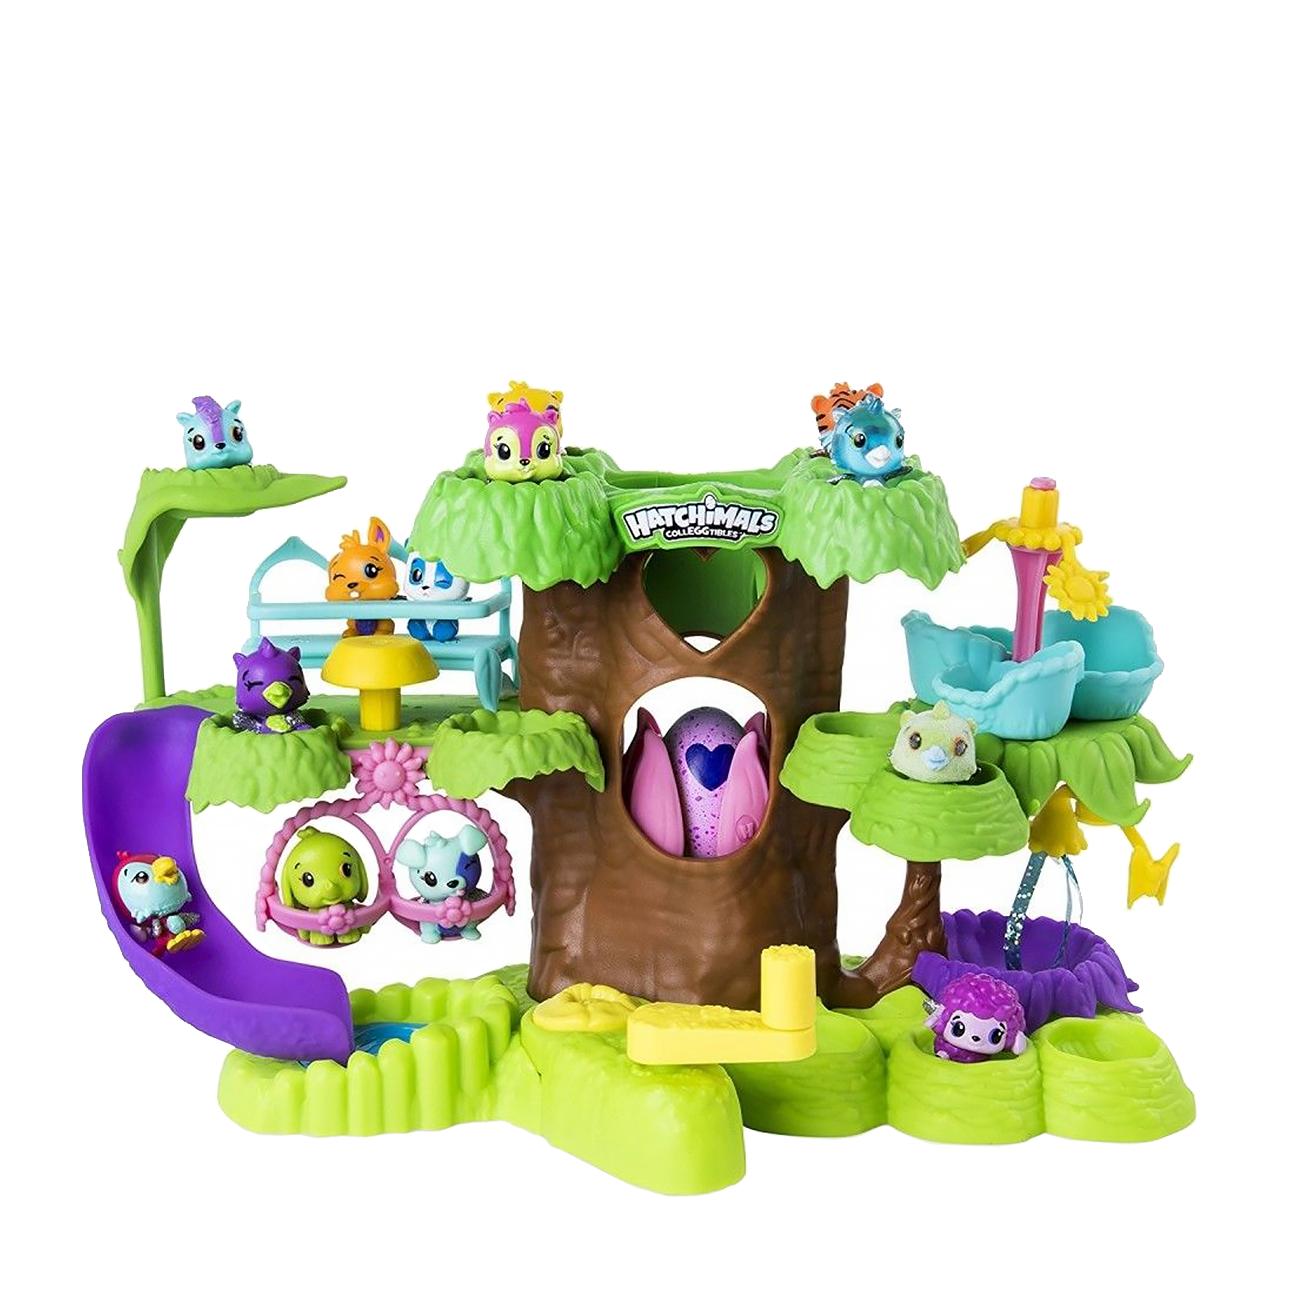 CollEGGtibles Nursery Playset